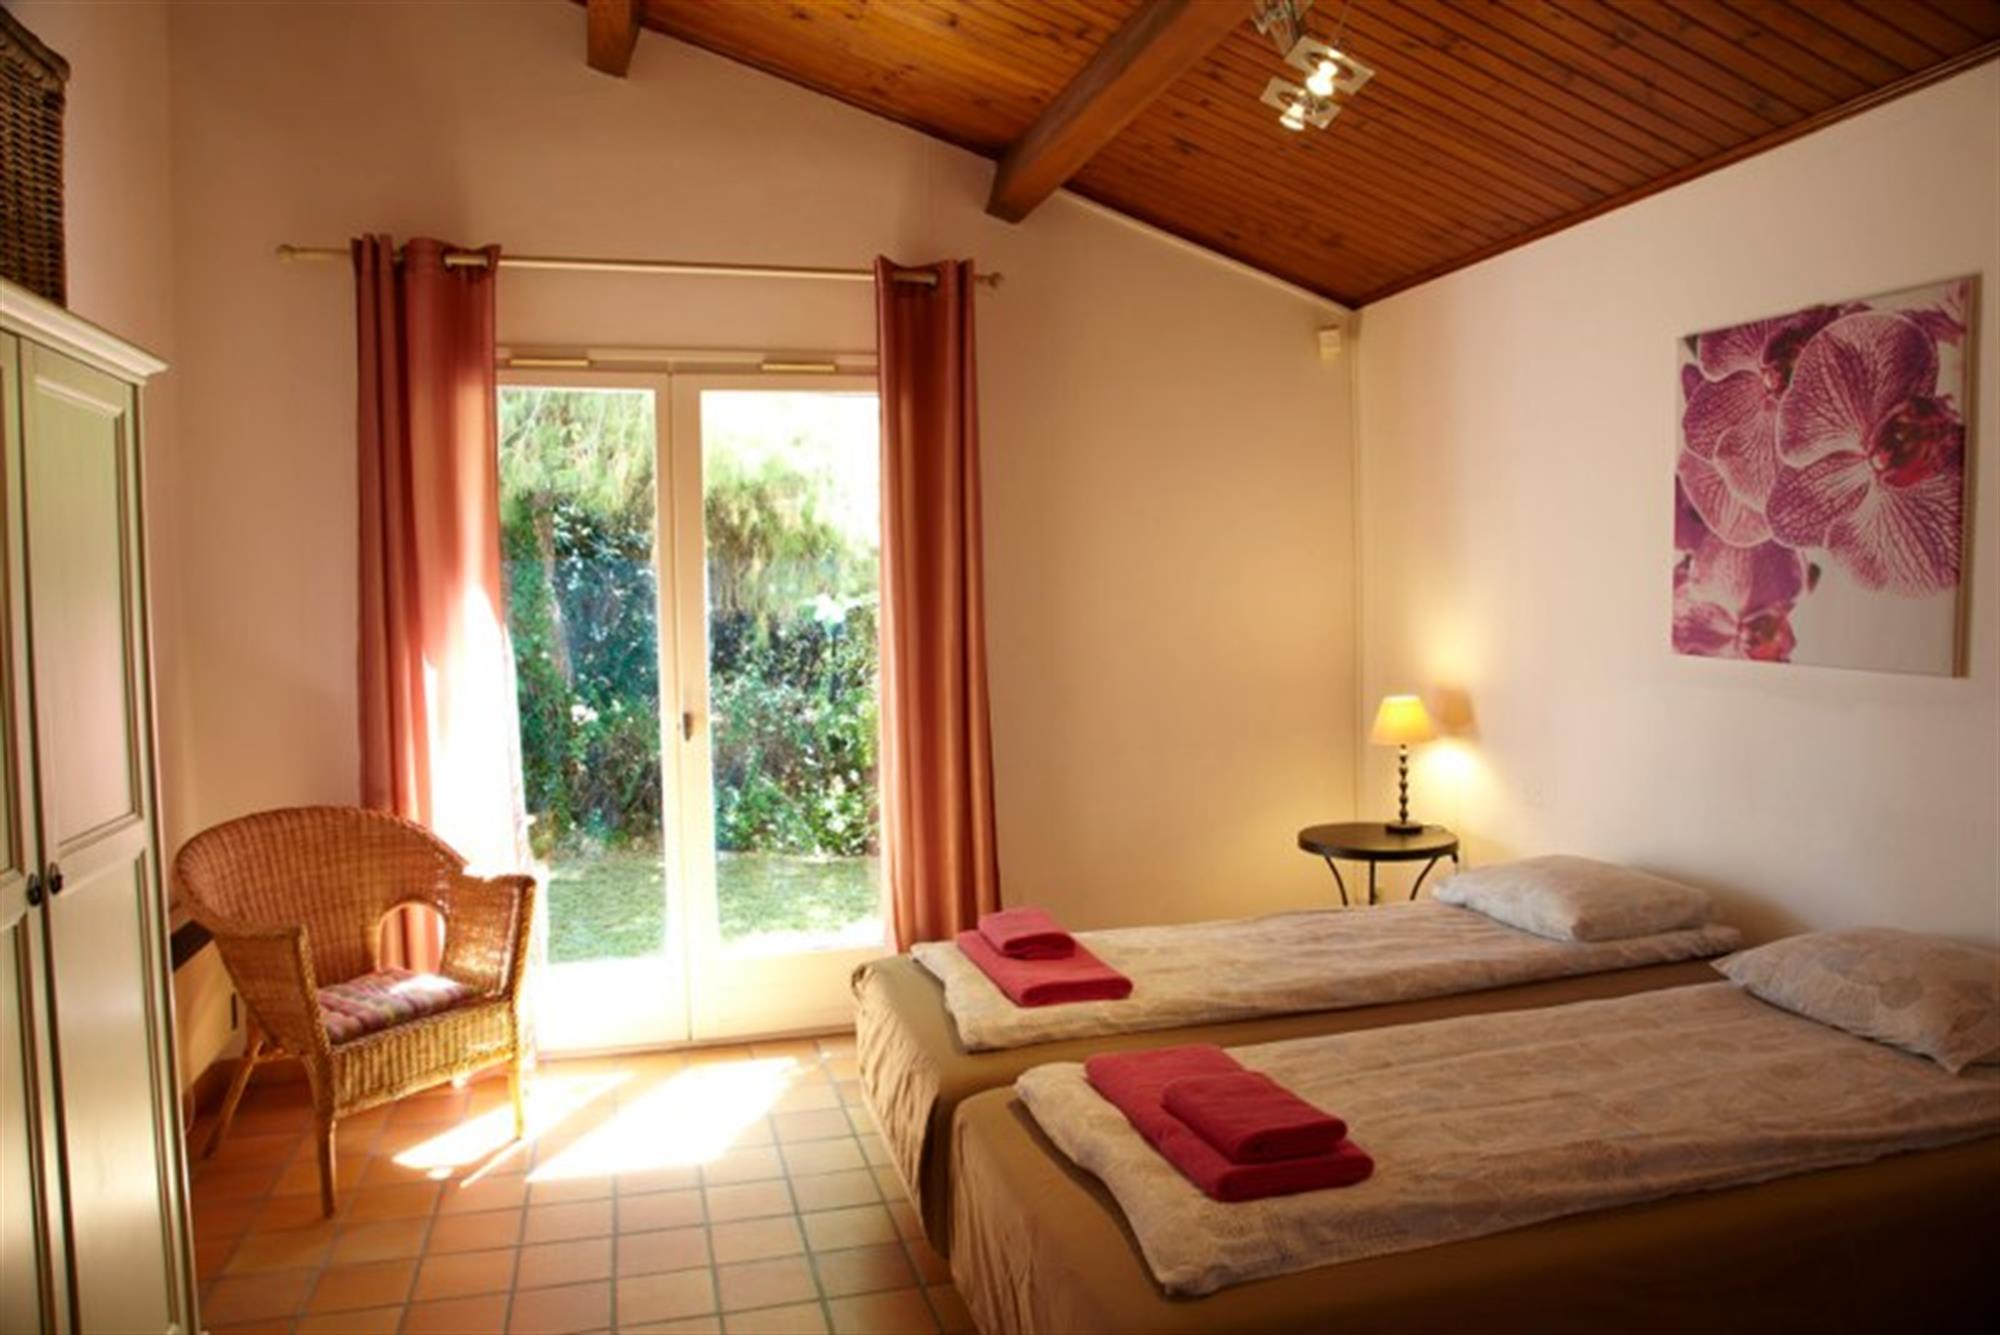 Villa i syd Frankrike - 12 sengeplasser